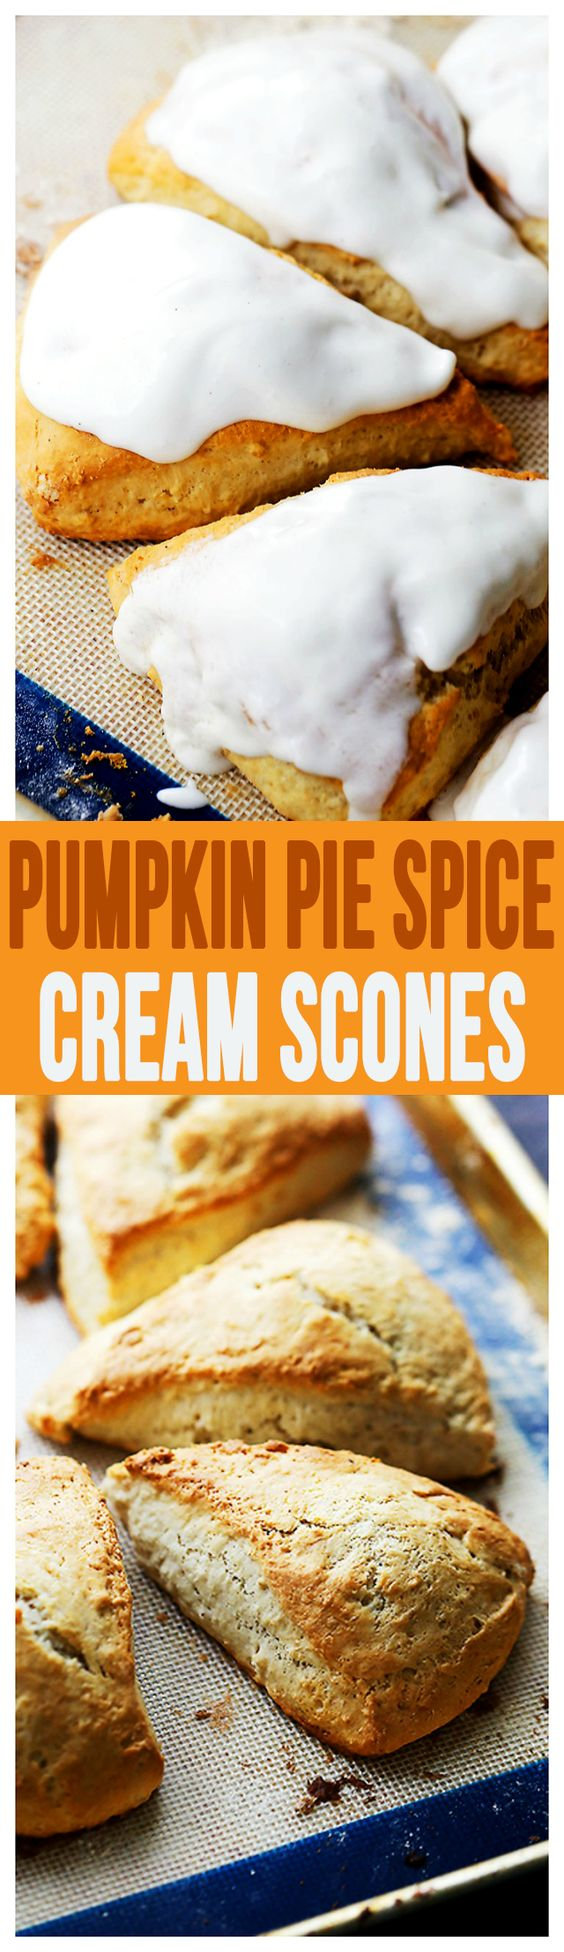 Pumpkin Pie Spice Cream Scones – Plump, rich, yet light and sweet scones flavored with pumpkin pie spice creamer and a simple spiced glaze. @indelight #PumpkinDelight #IDelight